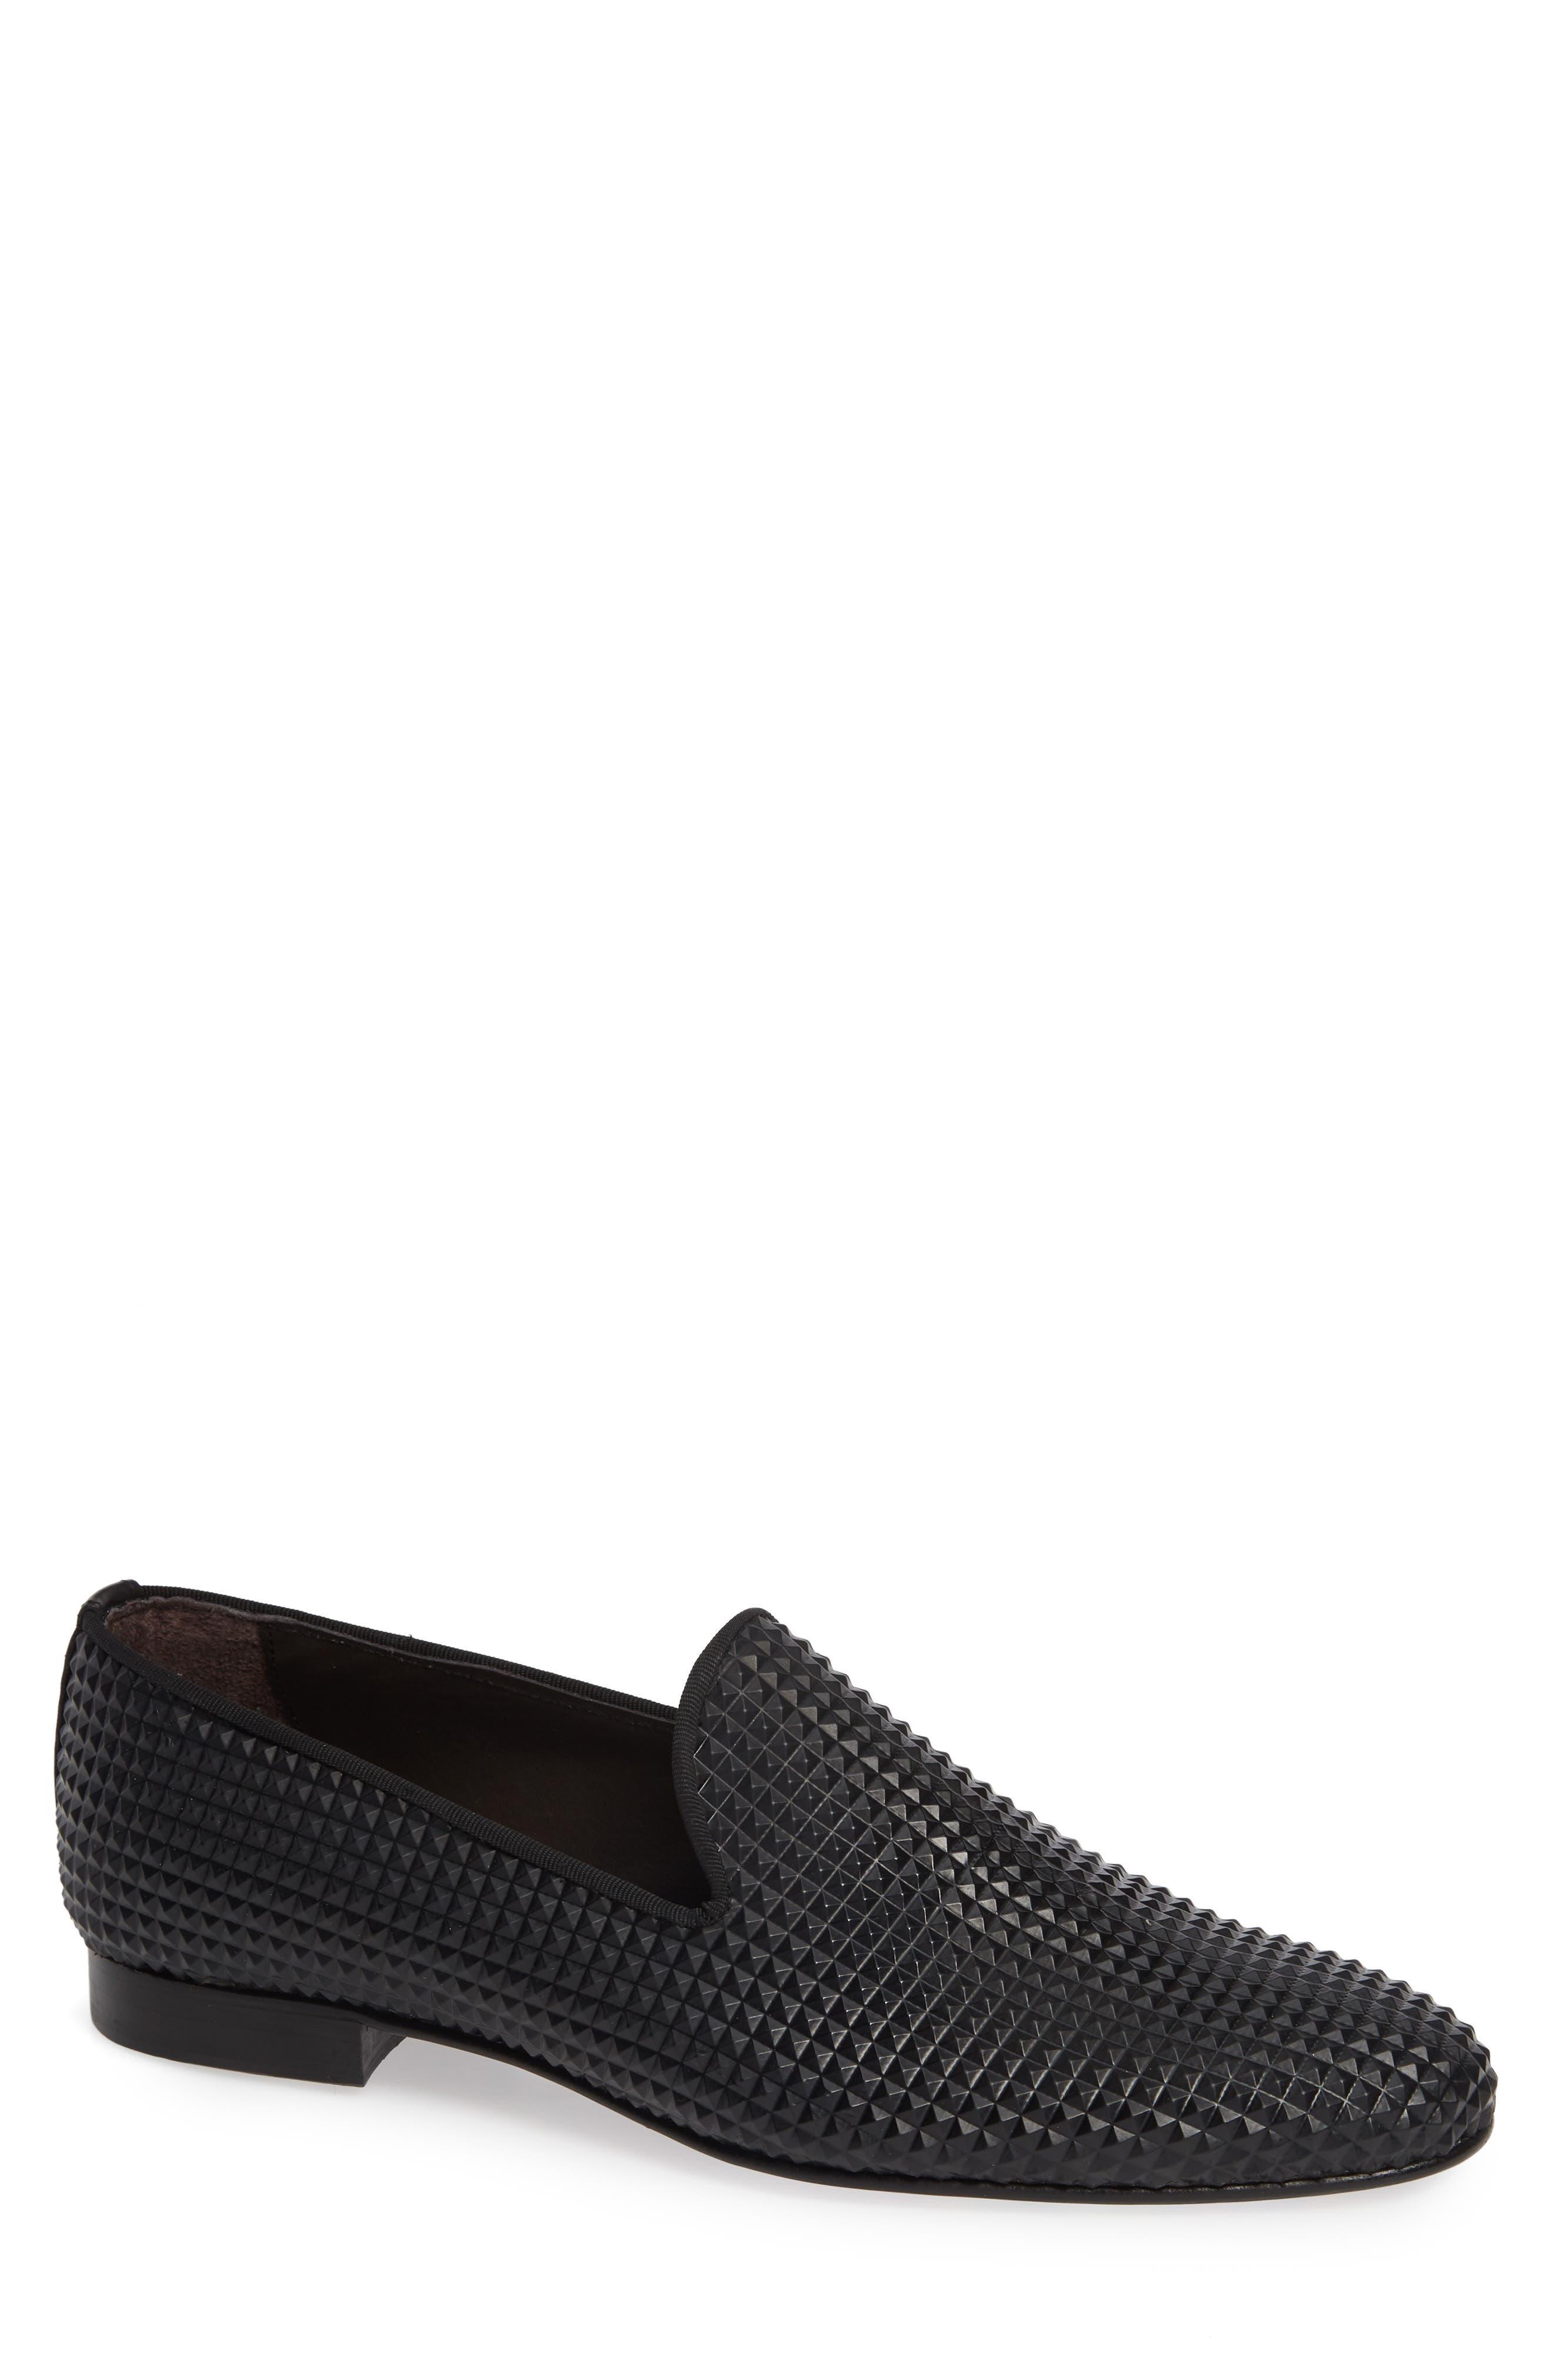 Milan Studded Venetian Loafer,                         Main,                         color, BLACK